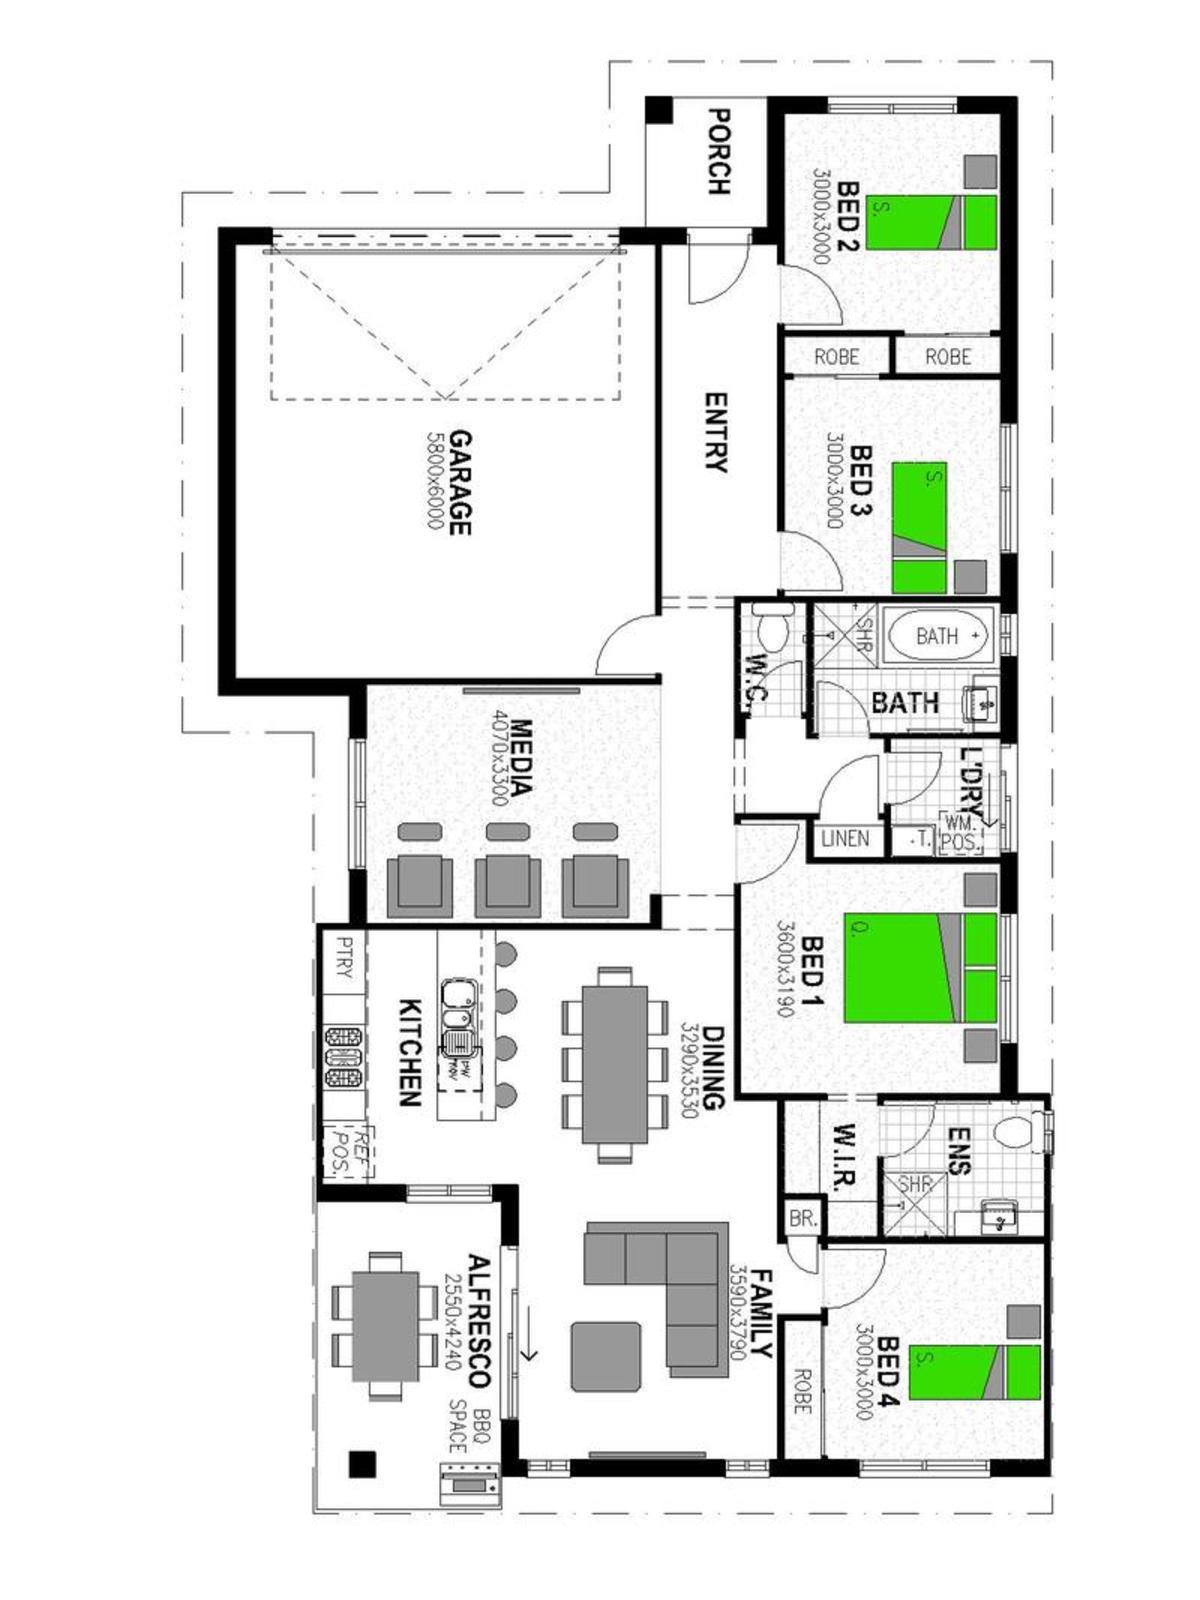 LOT 29 MURRUMBA CASTLE MURRUMBA DOWNS Floorplan